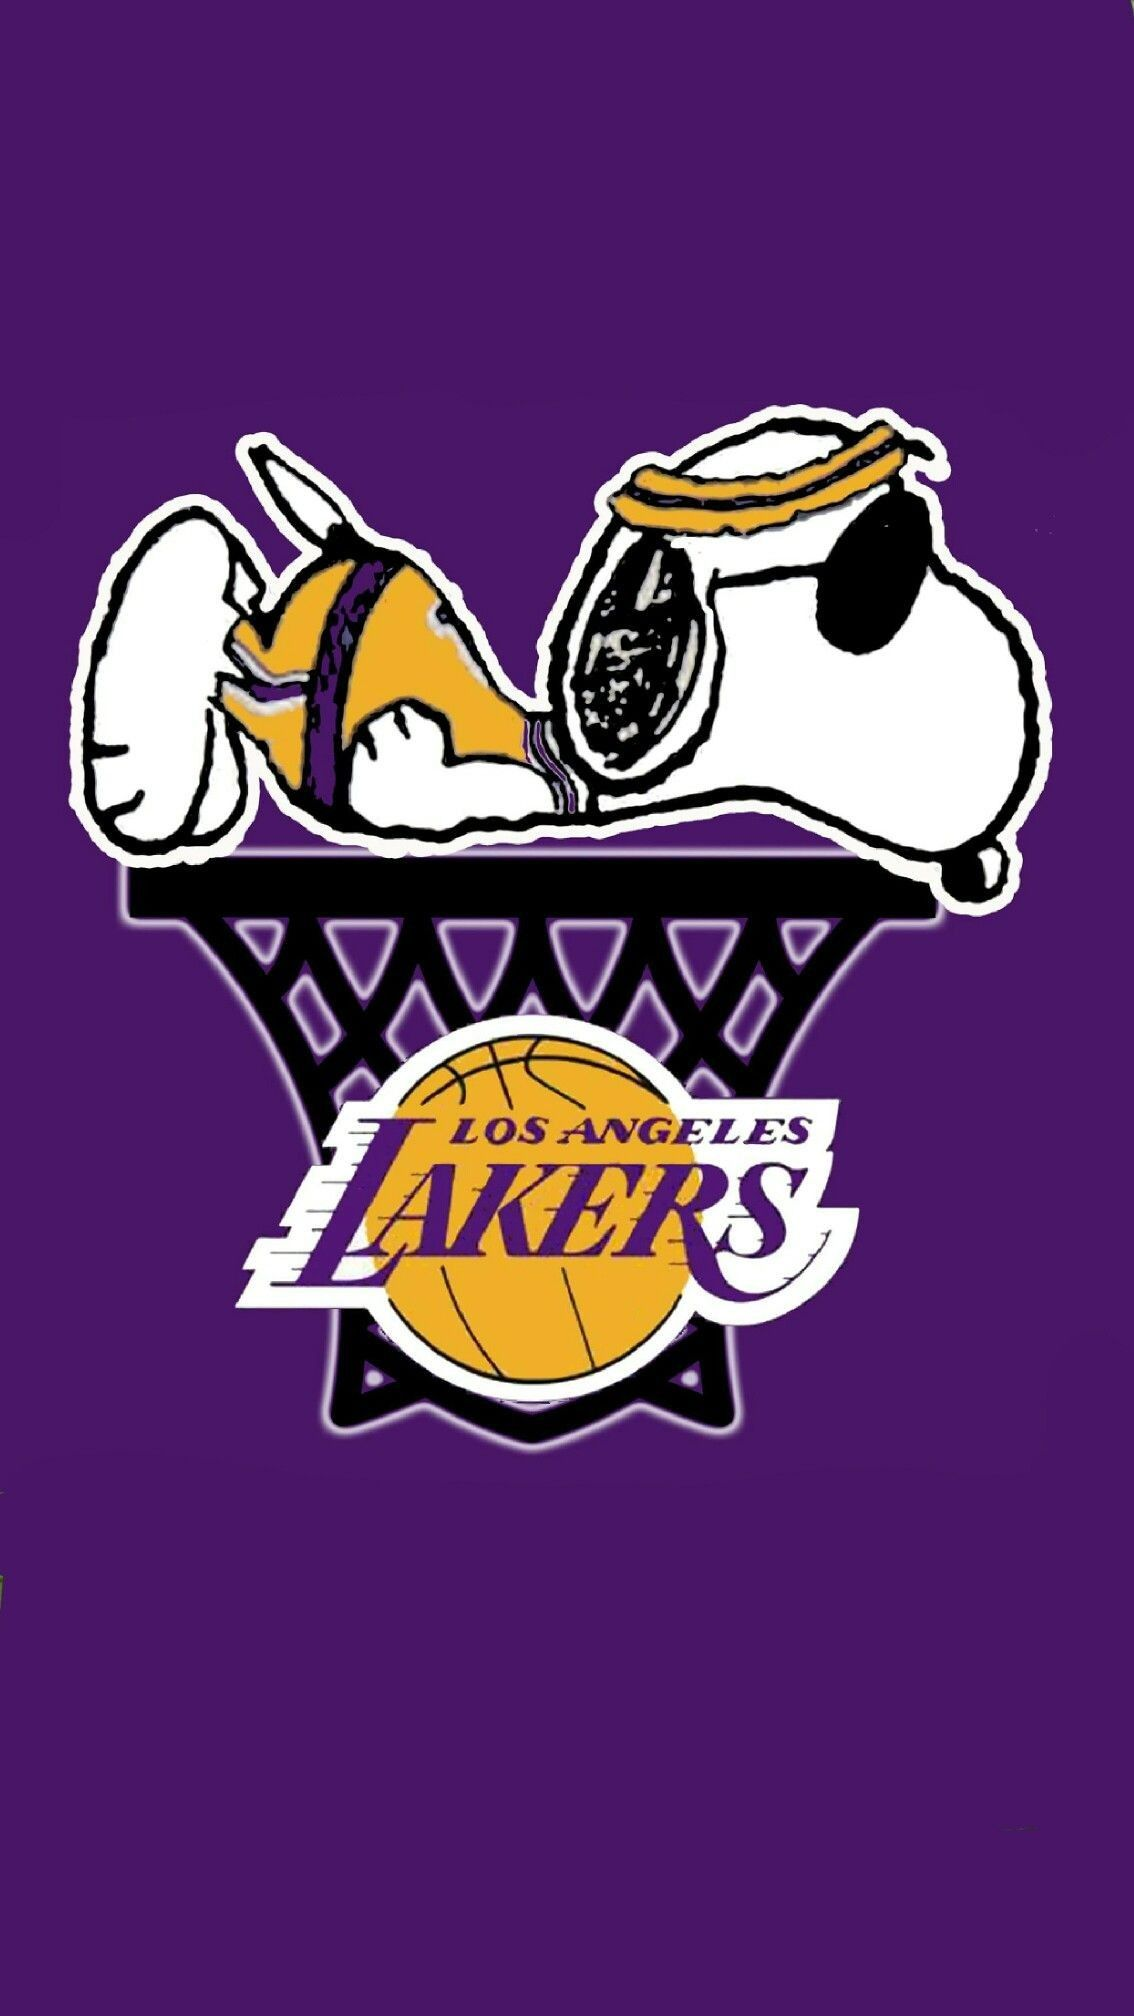 Pin by Thayara Eduarda on # NBA Wallpaper | Lakers wallpaper, Lakers ...